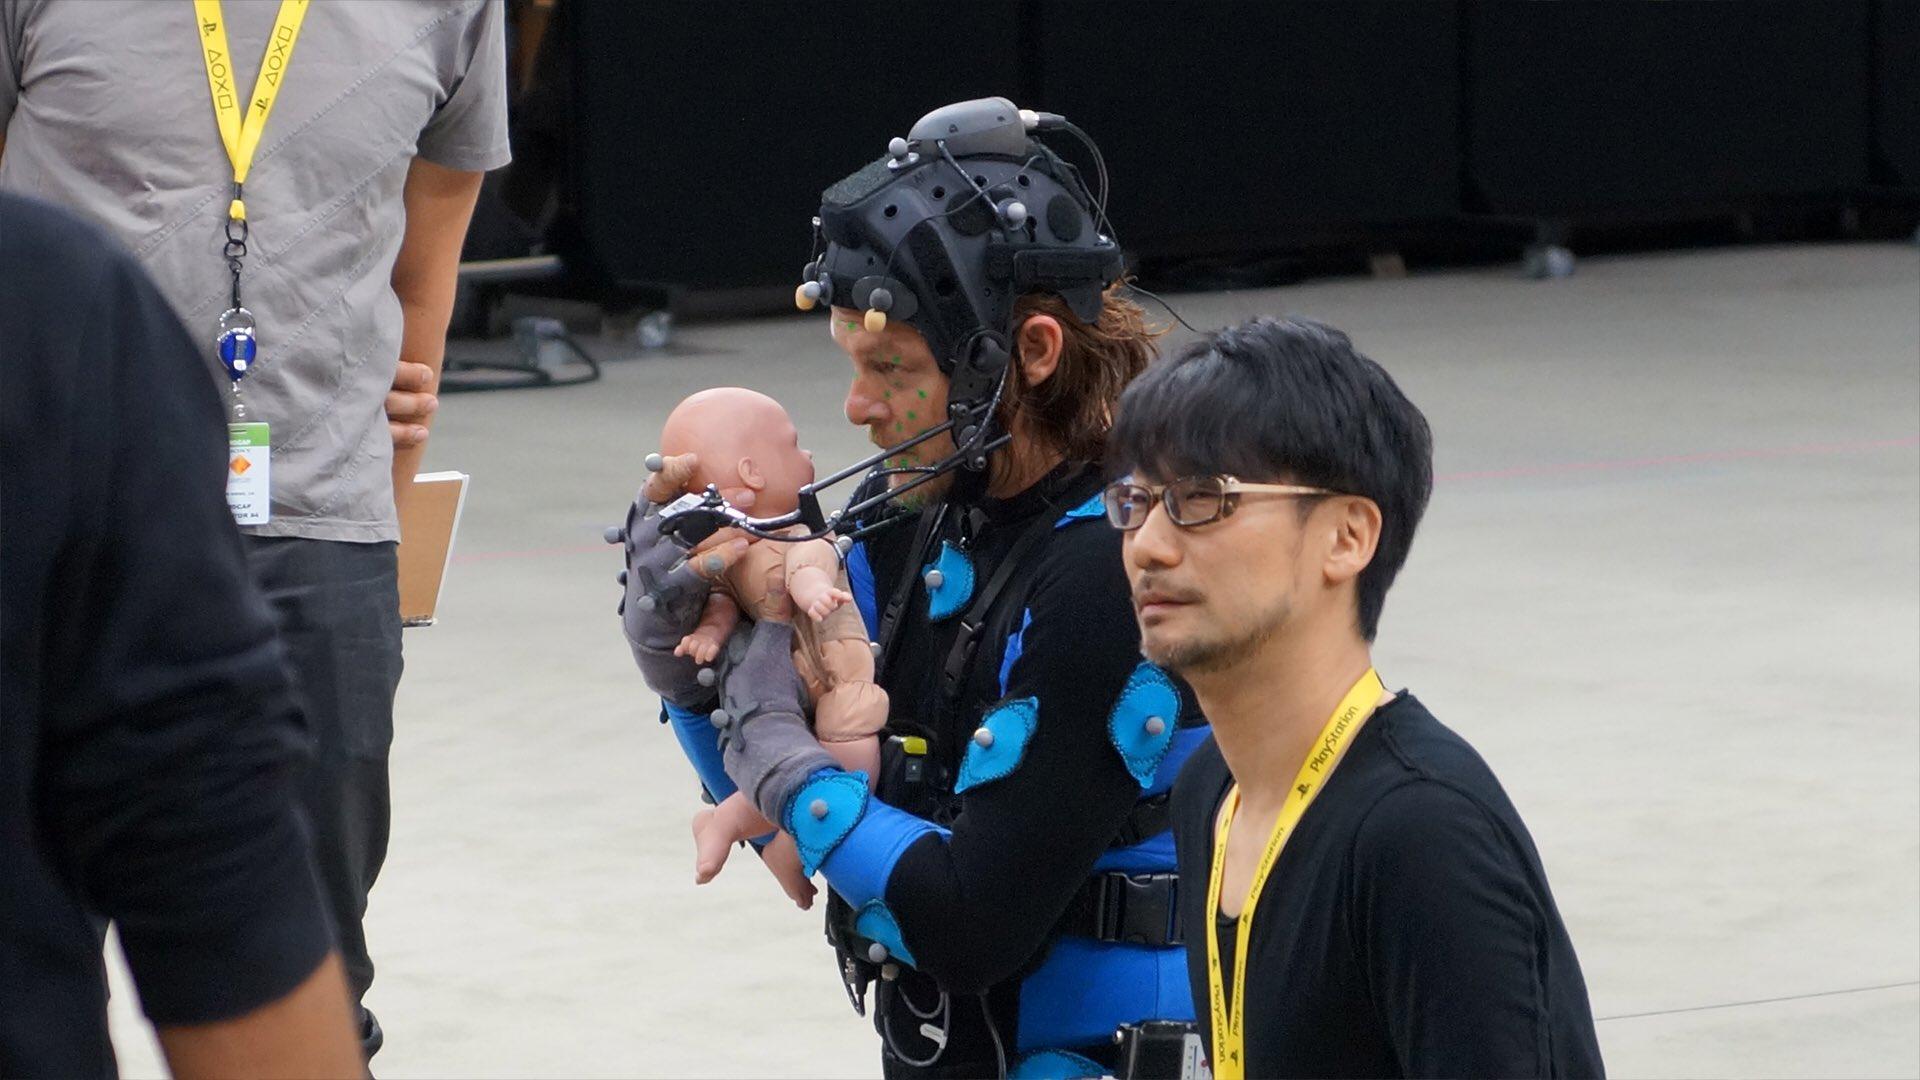 Unioni civili in VR.